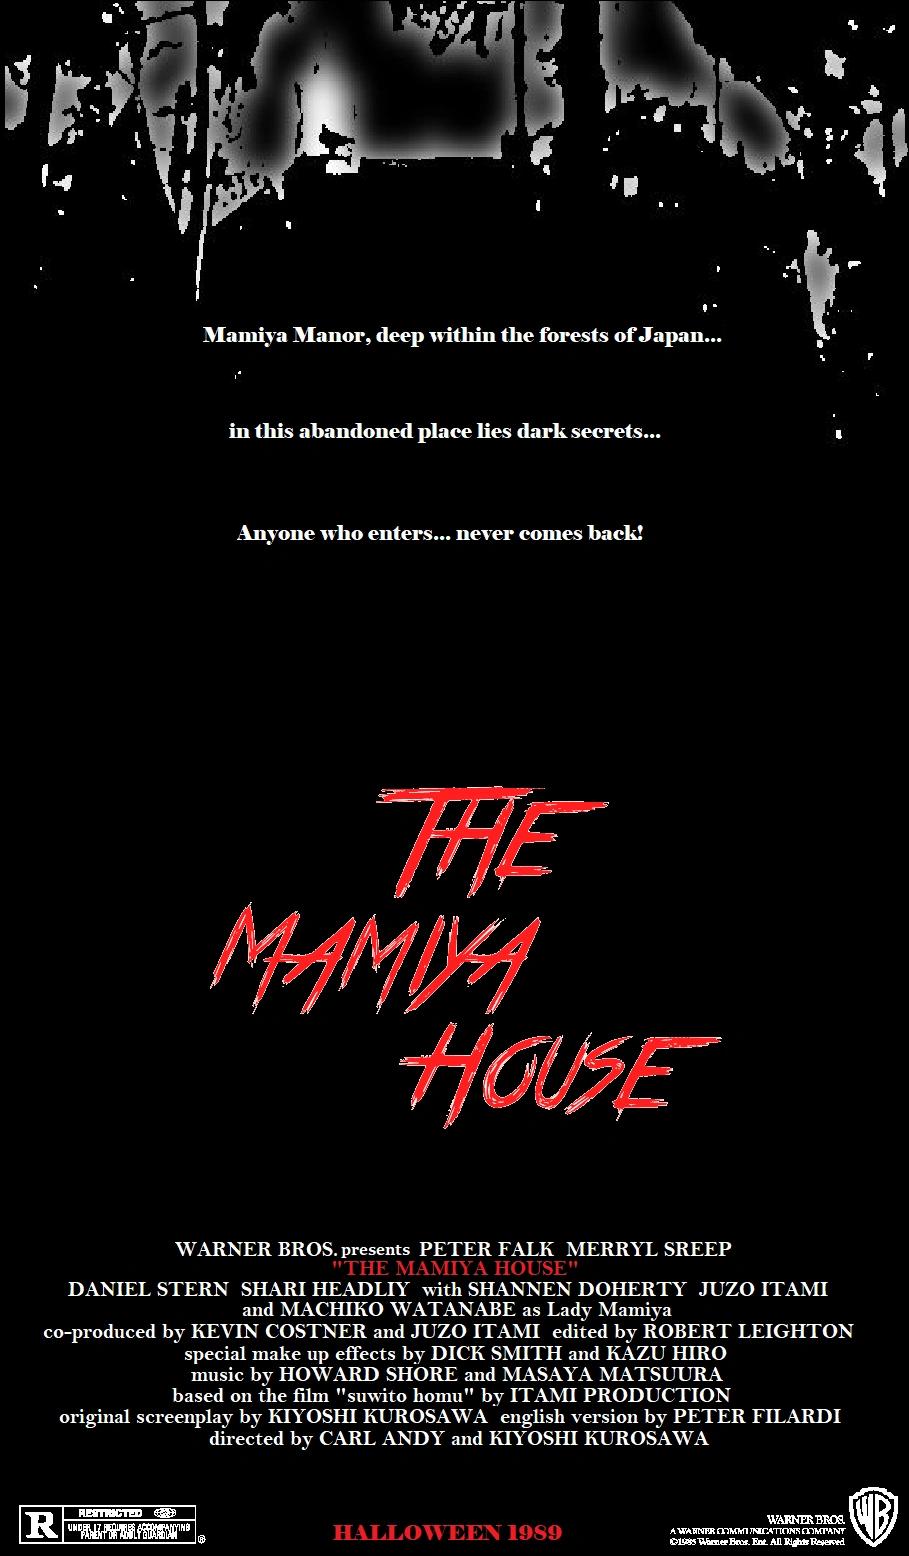 The Mamiya House